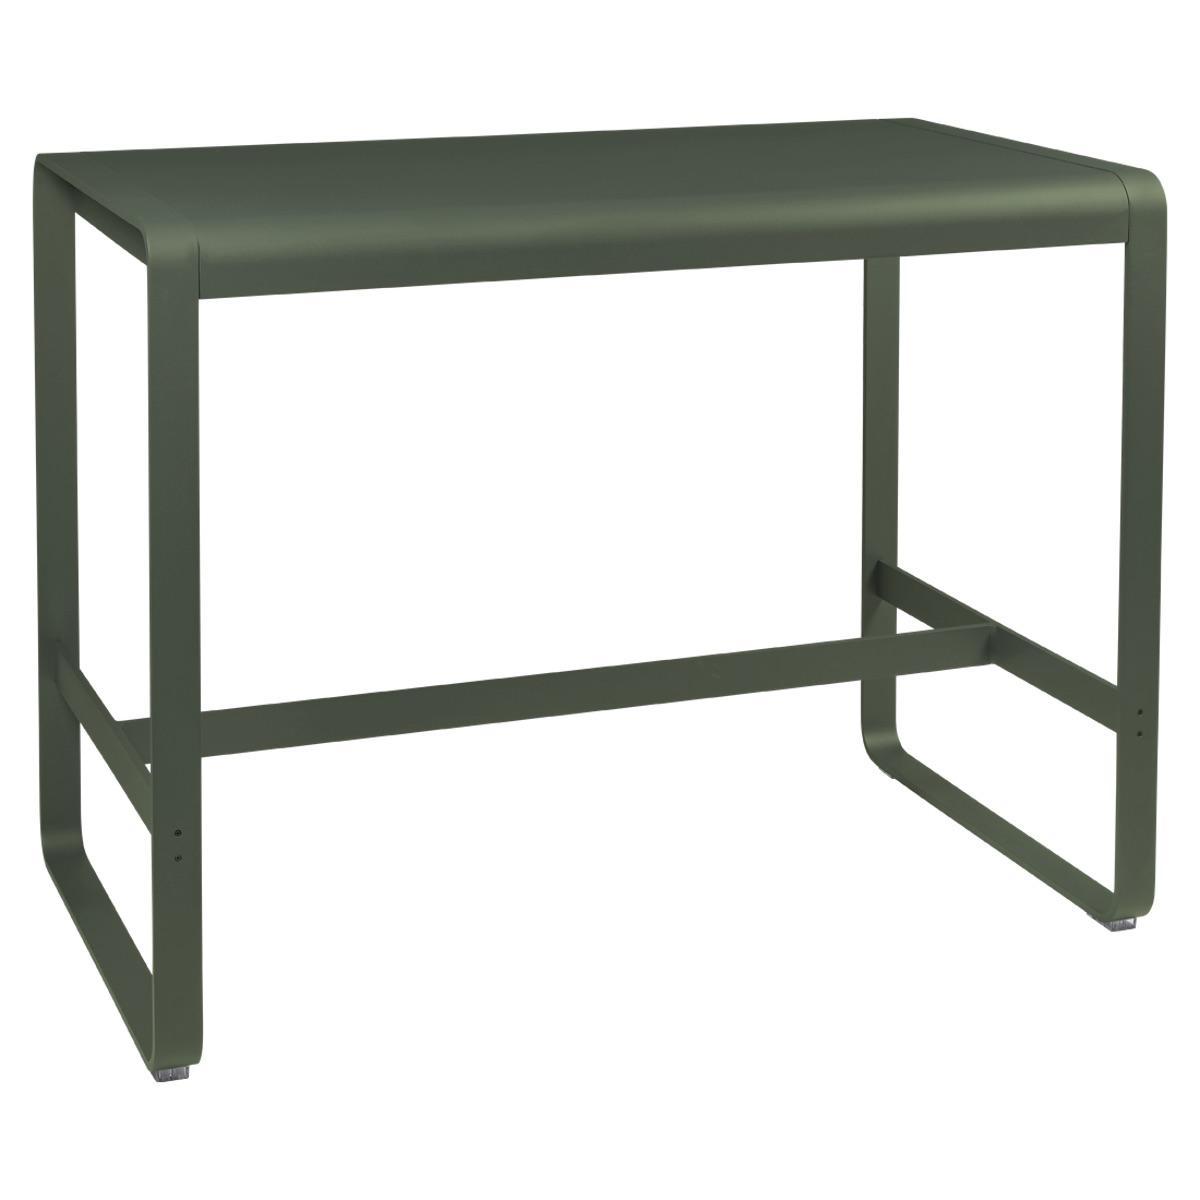 Table haute 80x140cm BELLEVIE Fermob romarin